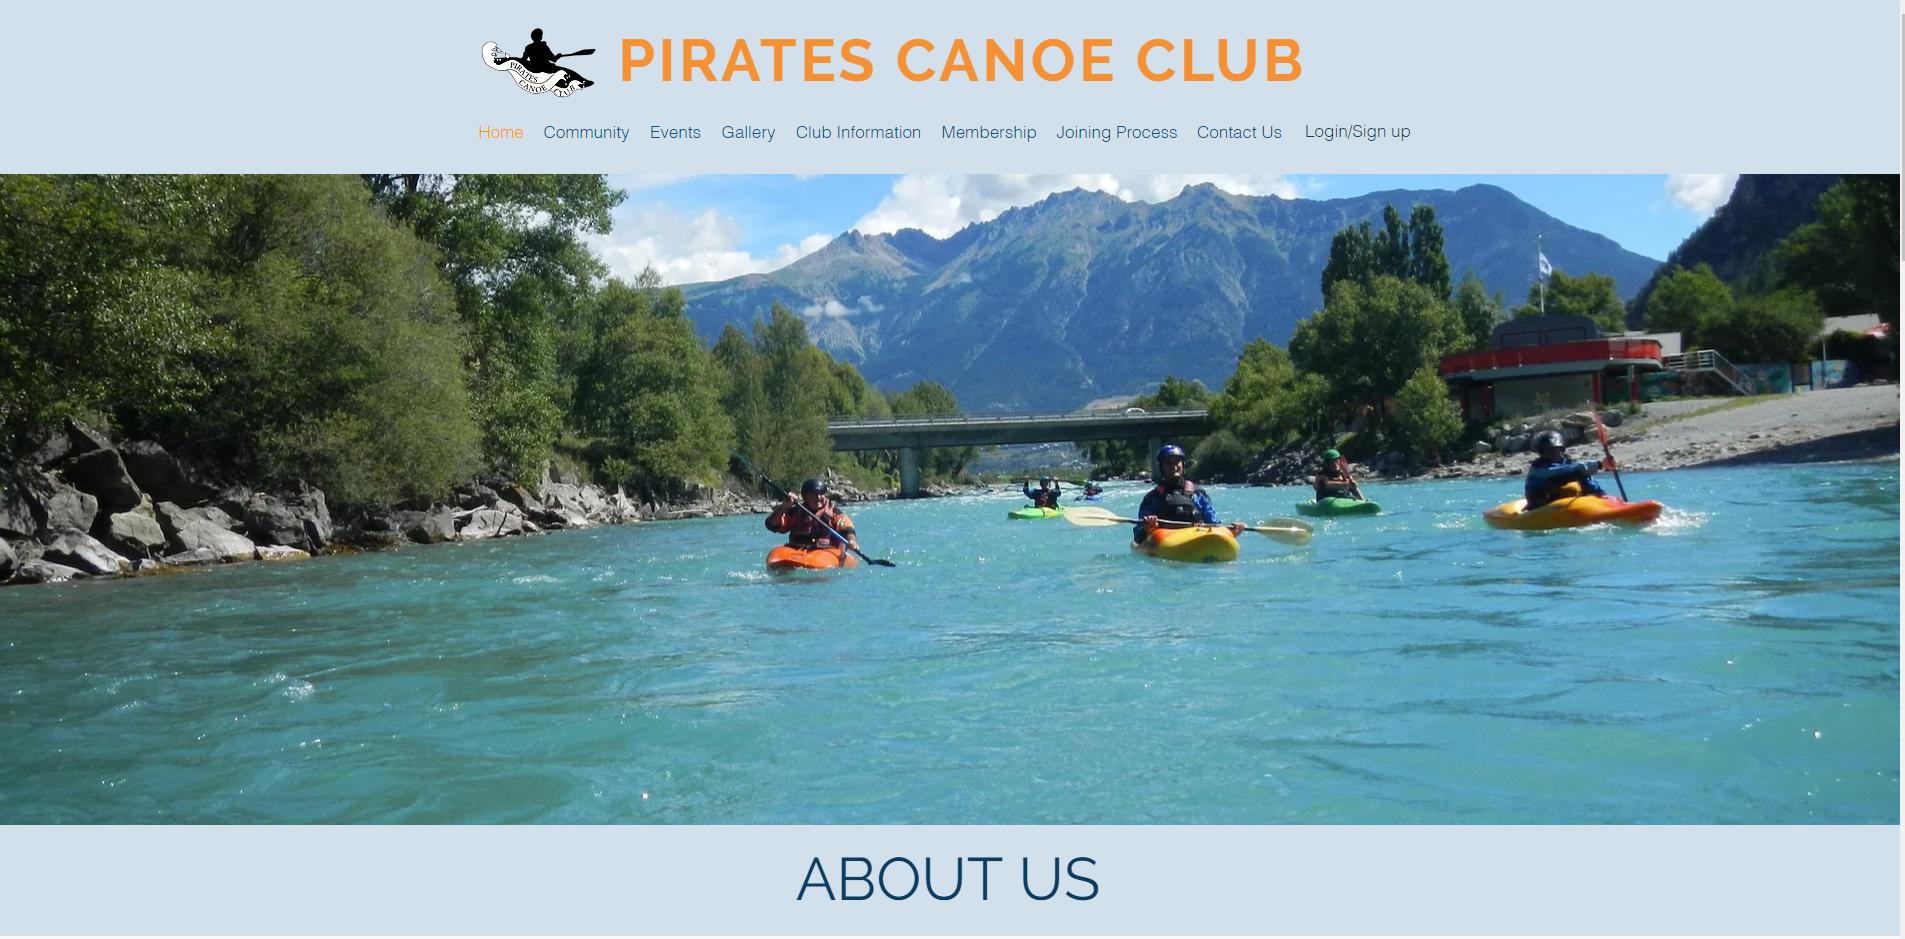 Canoe Club New Website.PNG